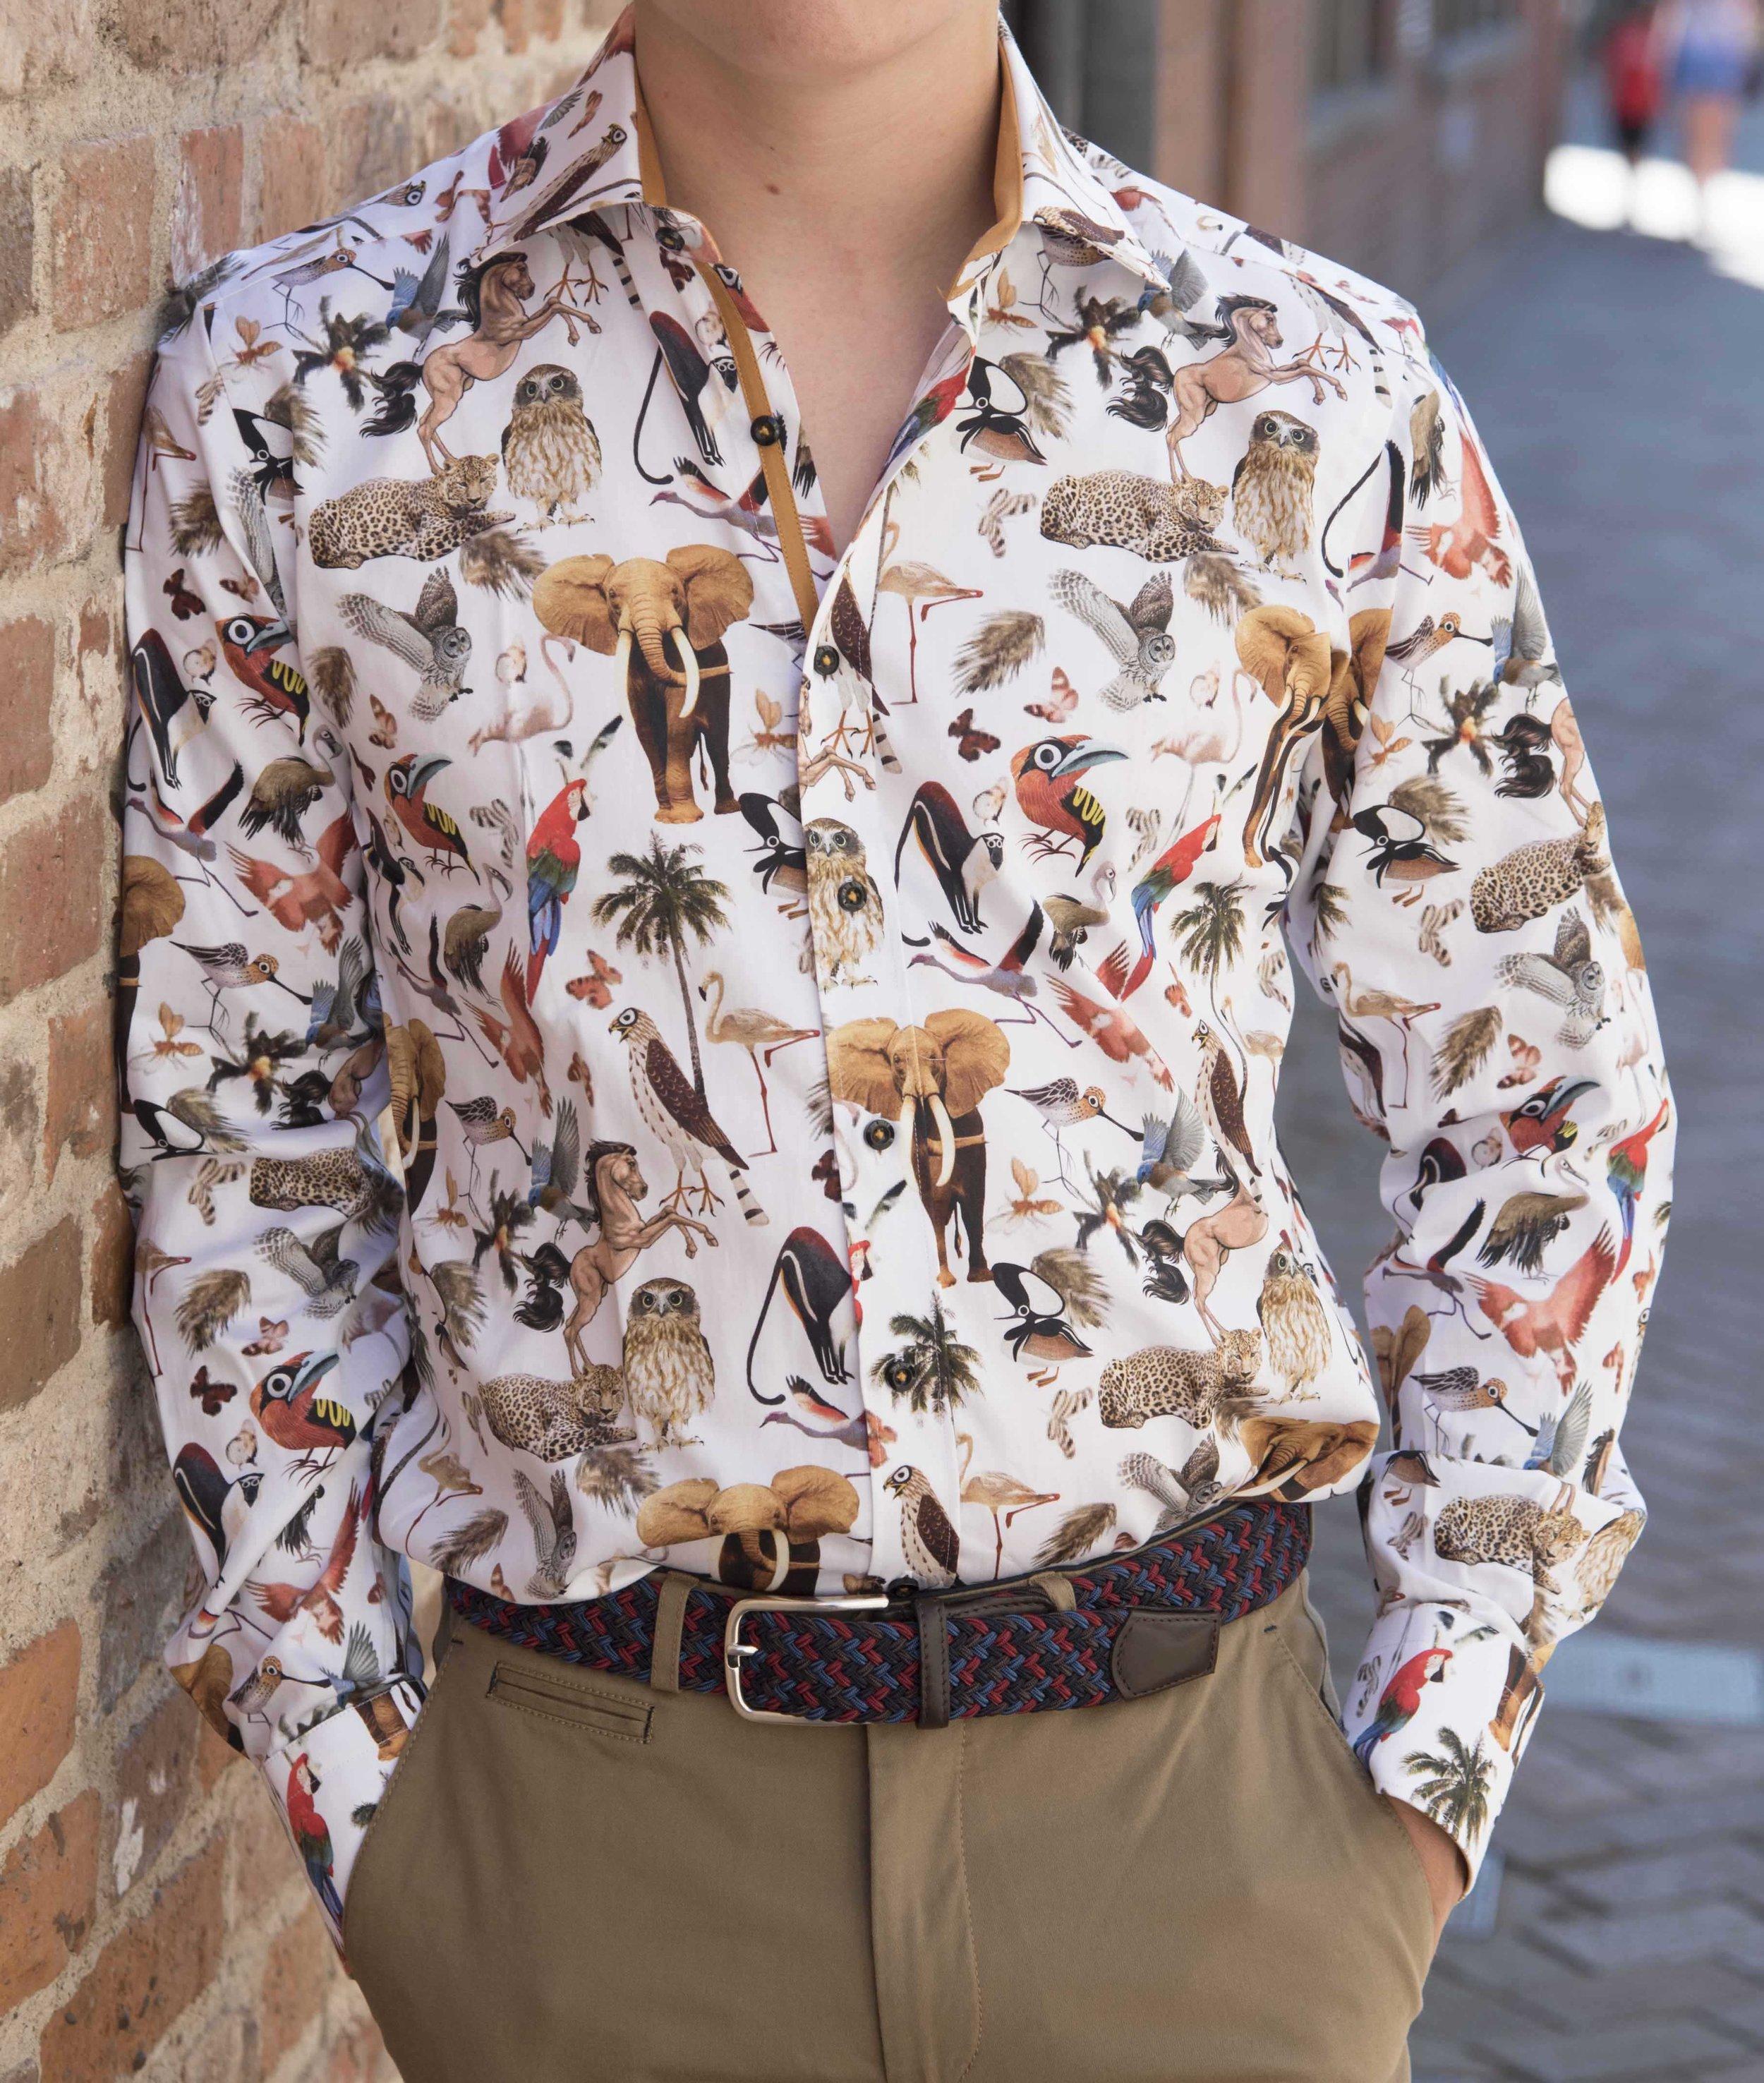 Jungle patterned dress shirt for web.jpg